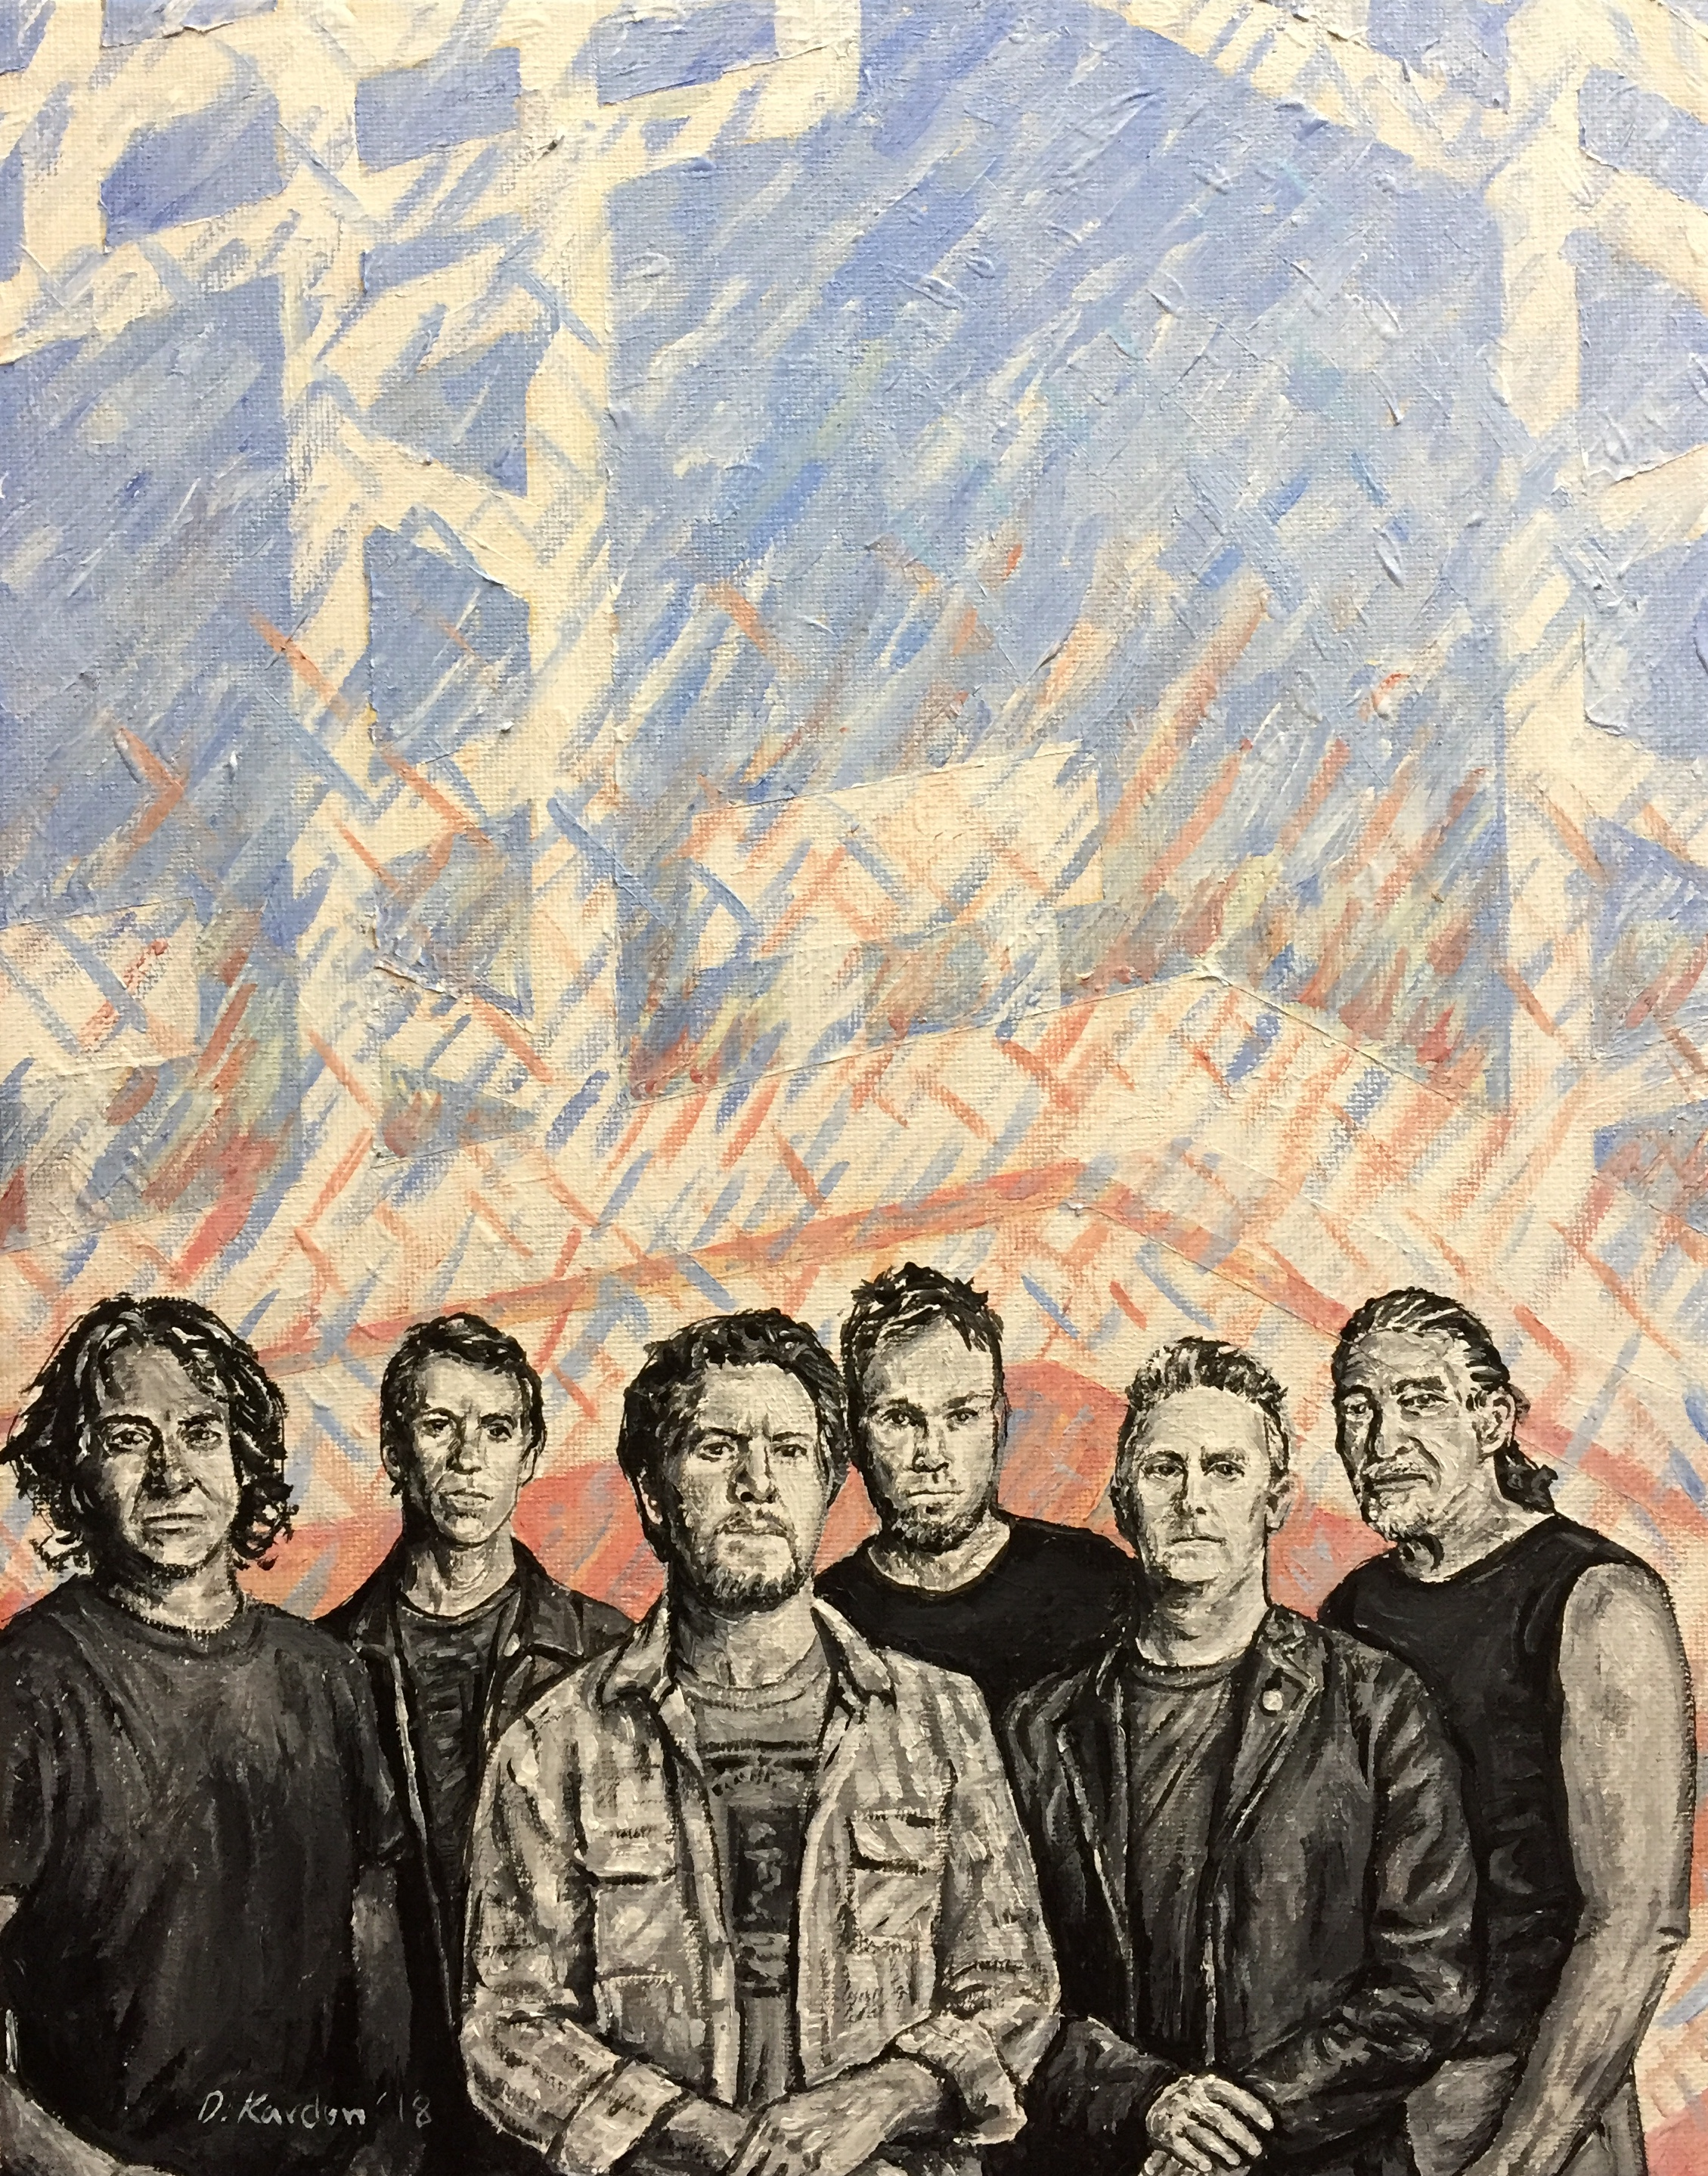 Pearl Jam Painting by Damon Kardon- 2018